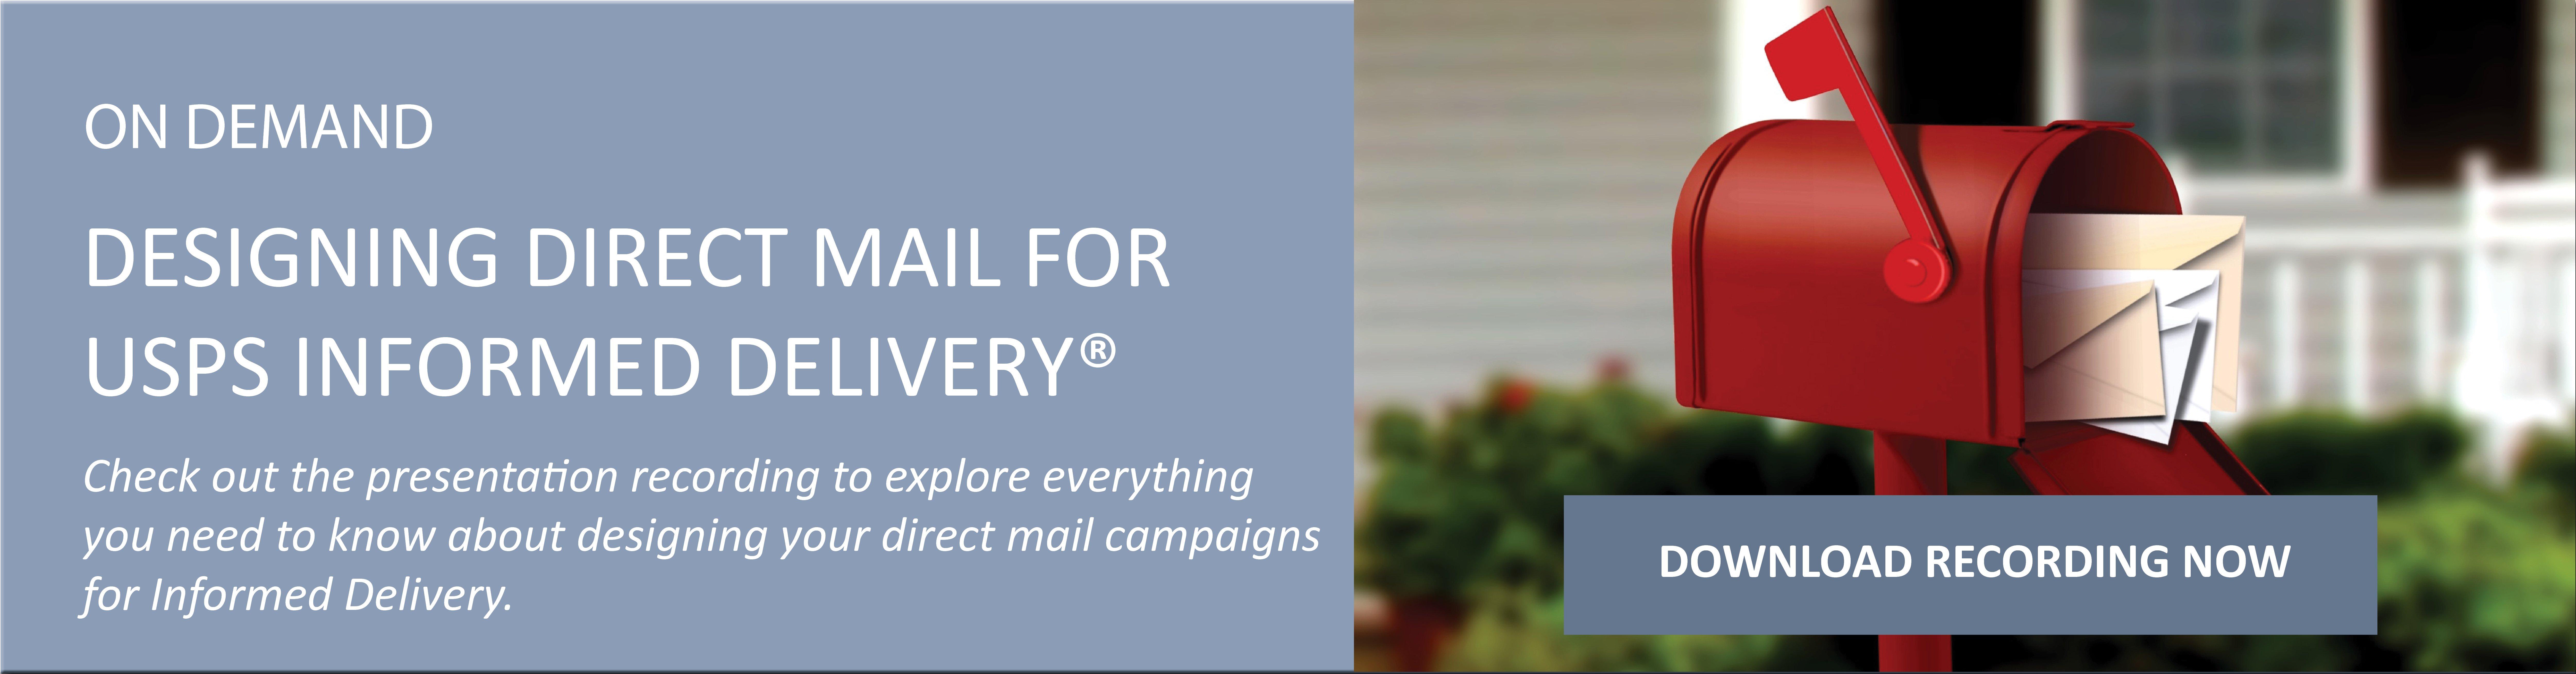 CTA-compu-mail-informed-delivery-presentation-recording